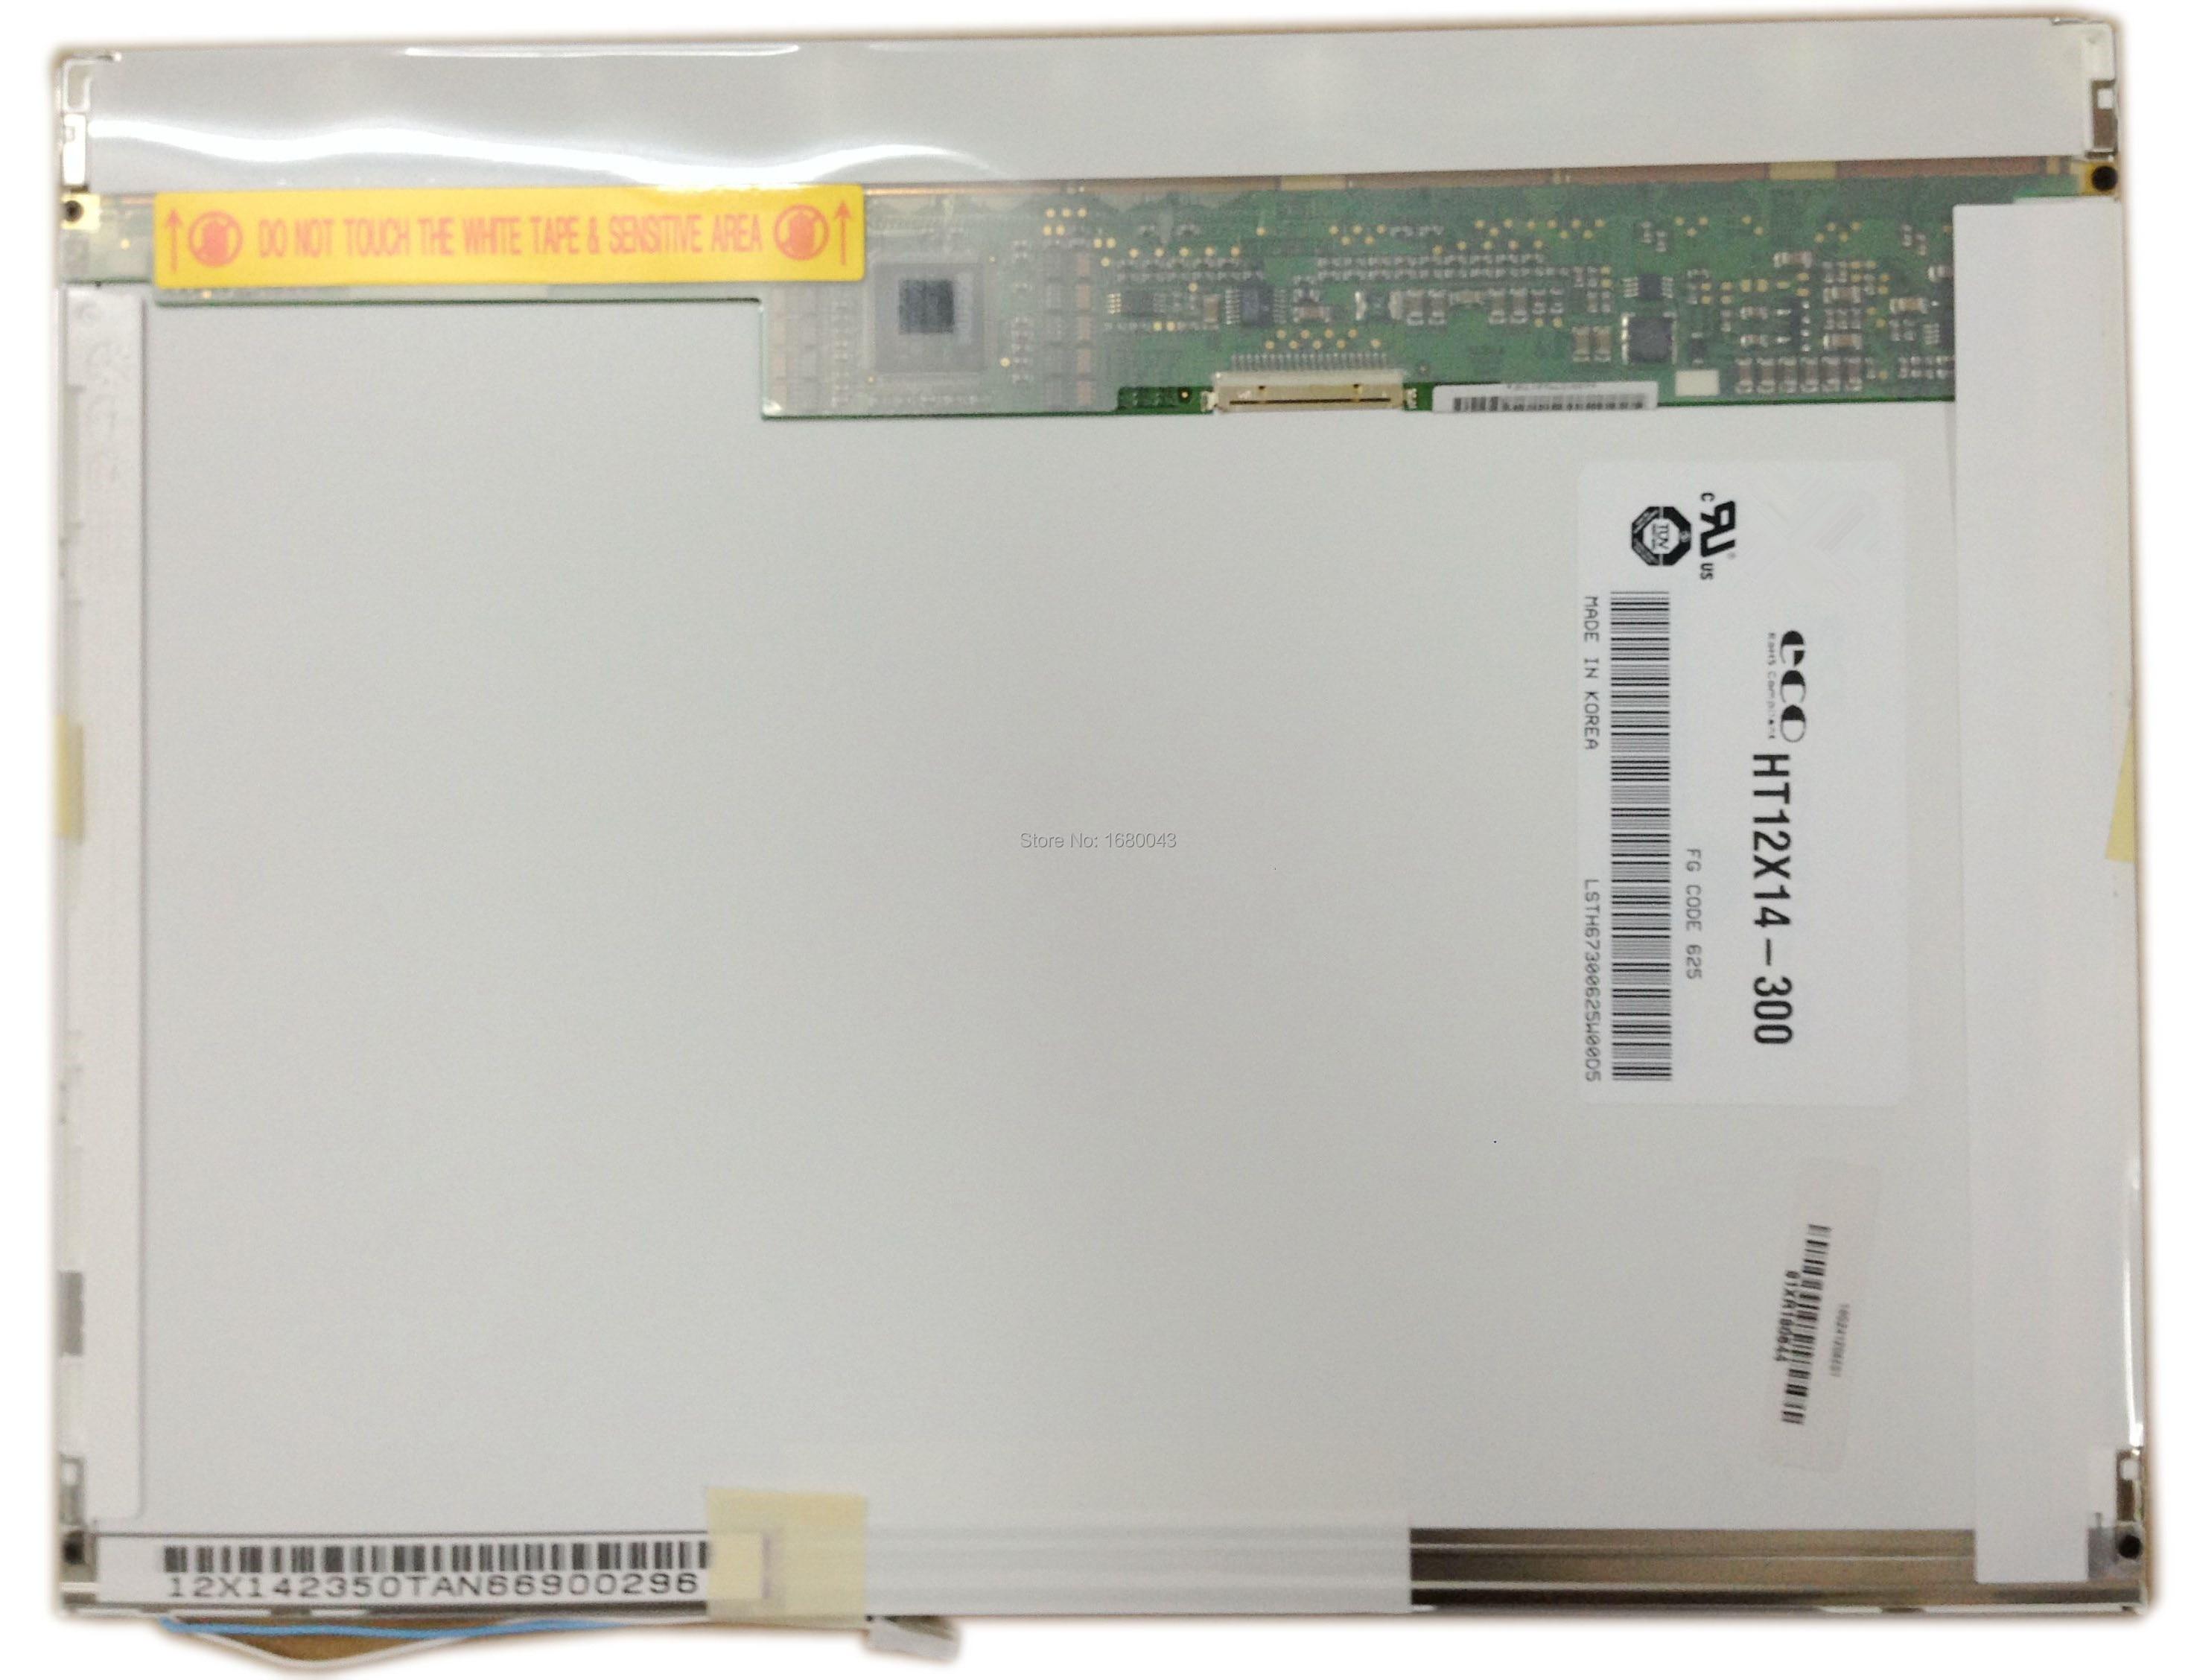 HT12X14-300 20PIN XF Schermi LCD per notebook PannelloHT12X14-300 20PIN XF Schermi LCD per notebook Pannello